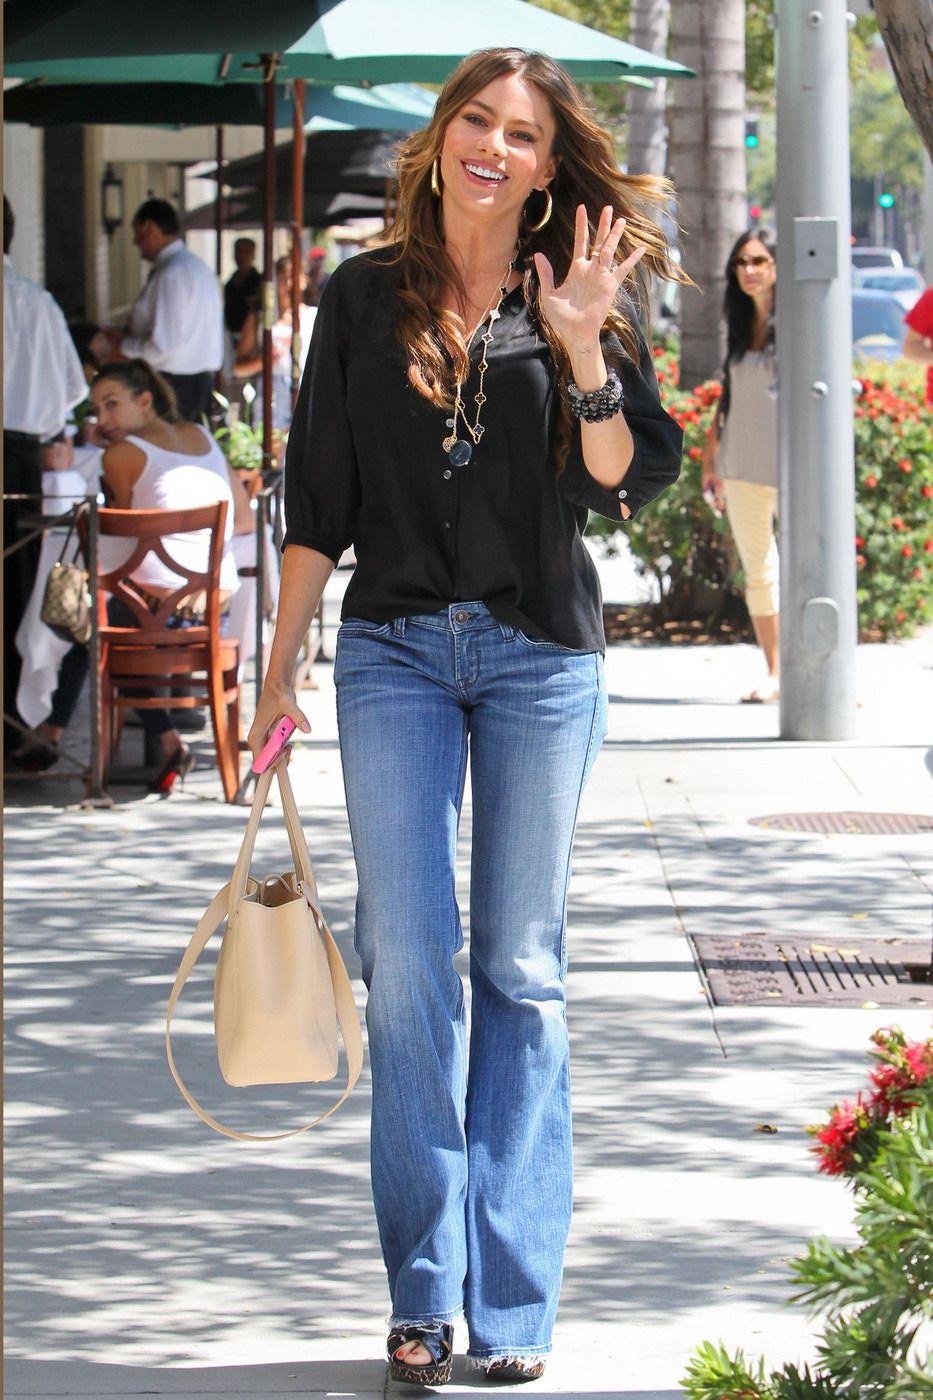 51a11636db0d5 Rich & Skinny Jeans : Celebrities in Designer Jeans from Denim Blog ...